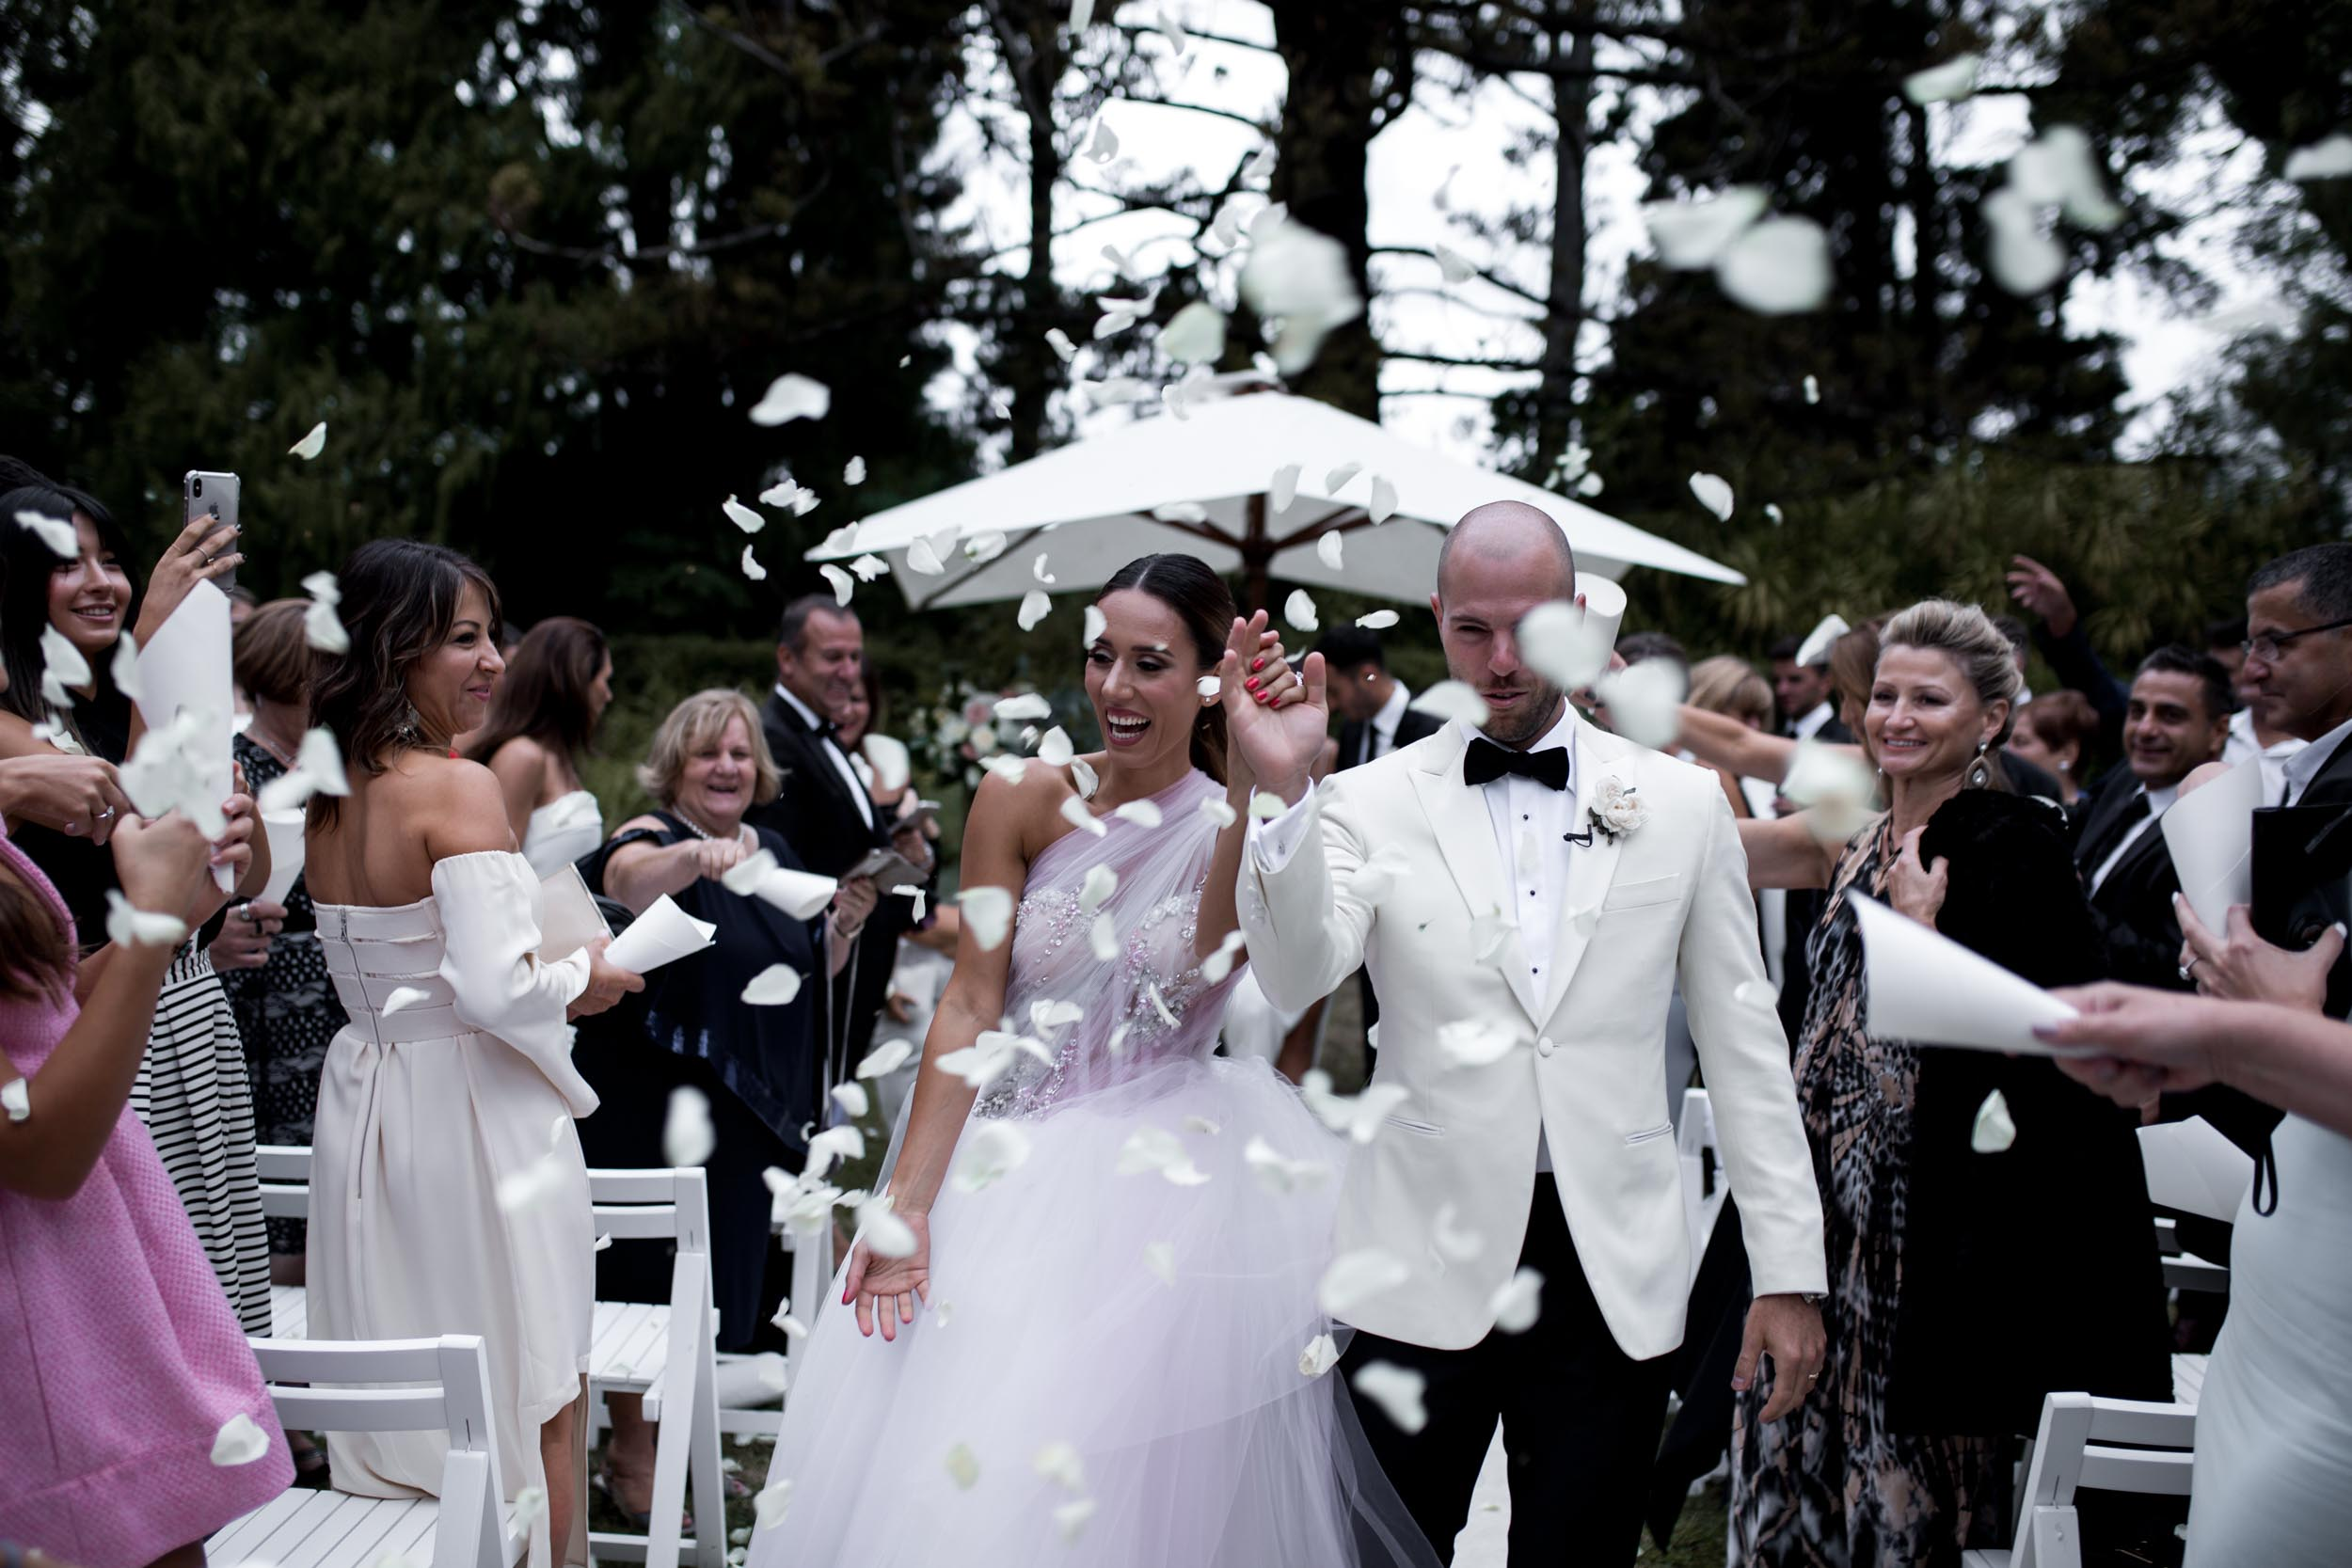 Athanasia & Jonathan - Ath & Jon's Melbourne wedding was the epitome of elegance.